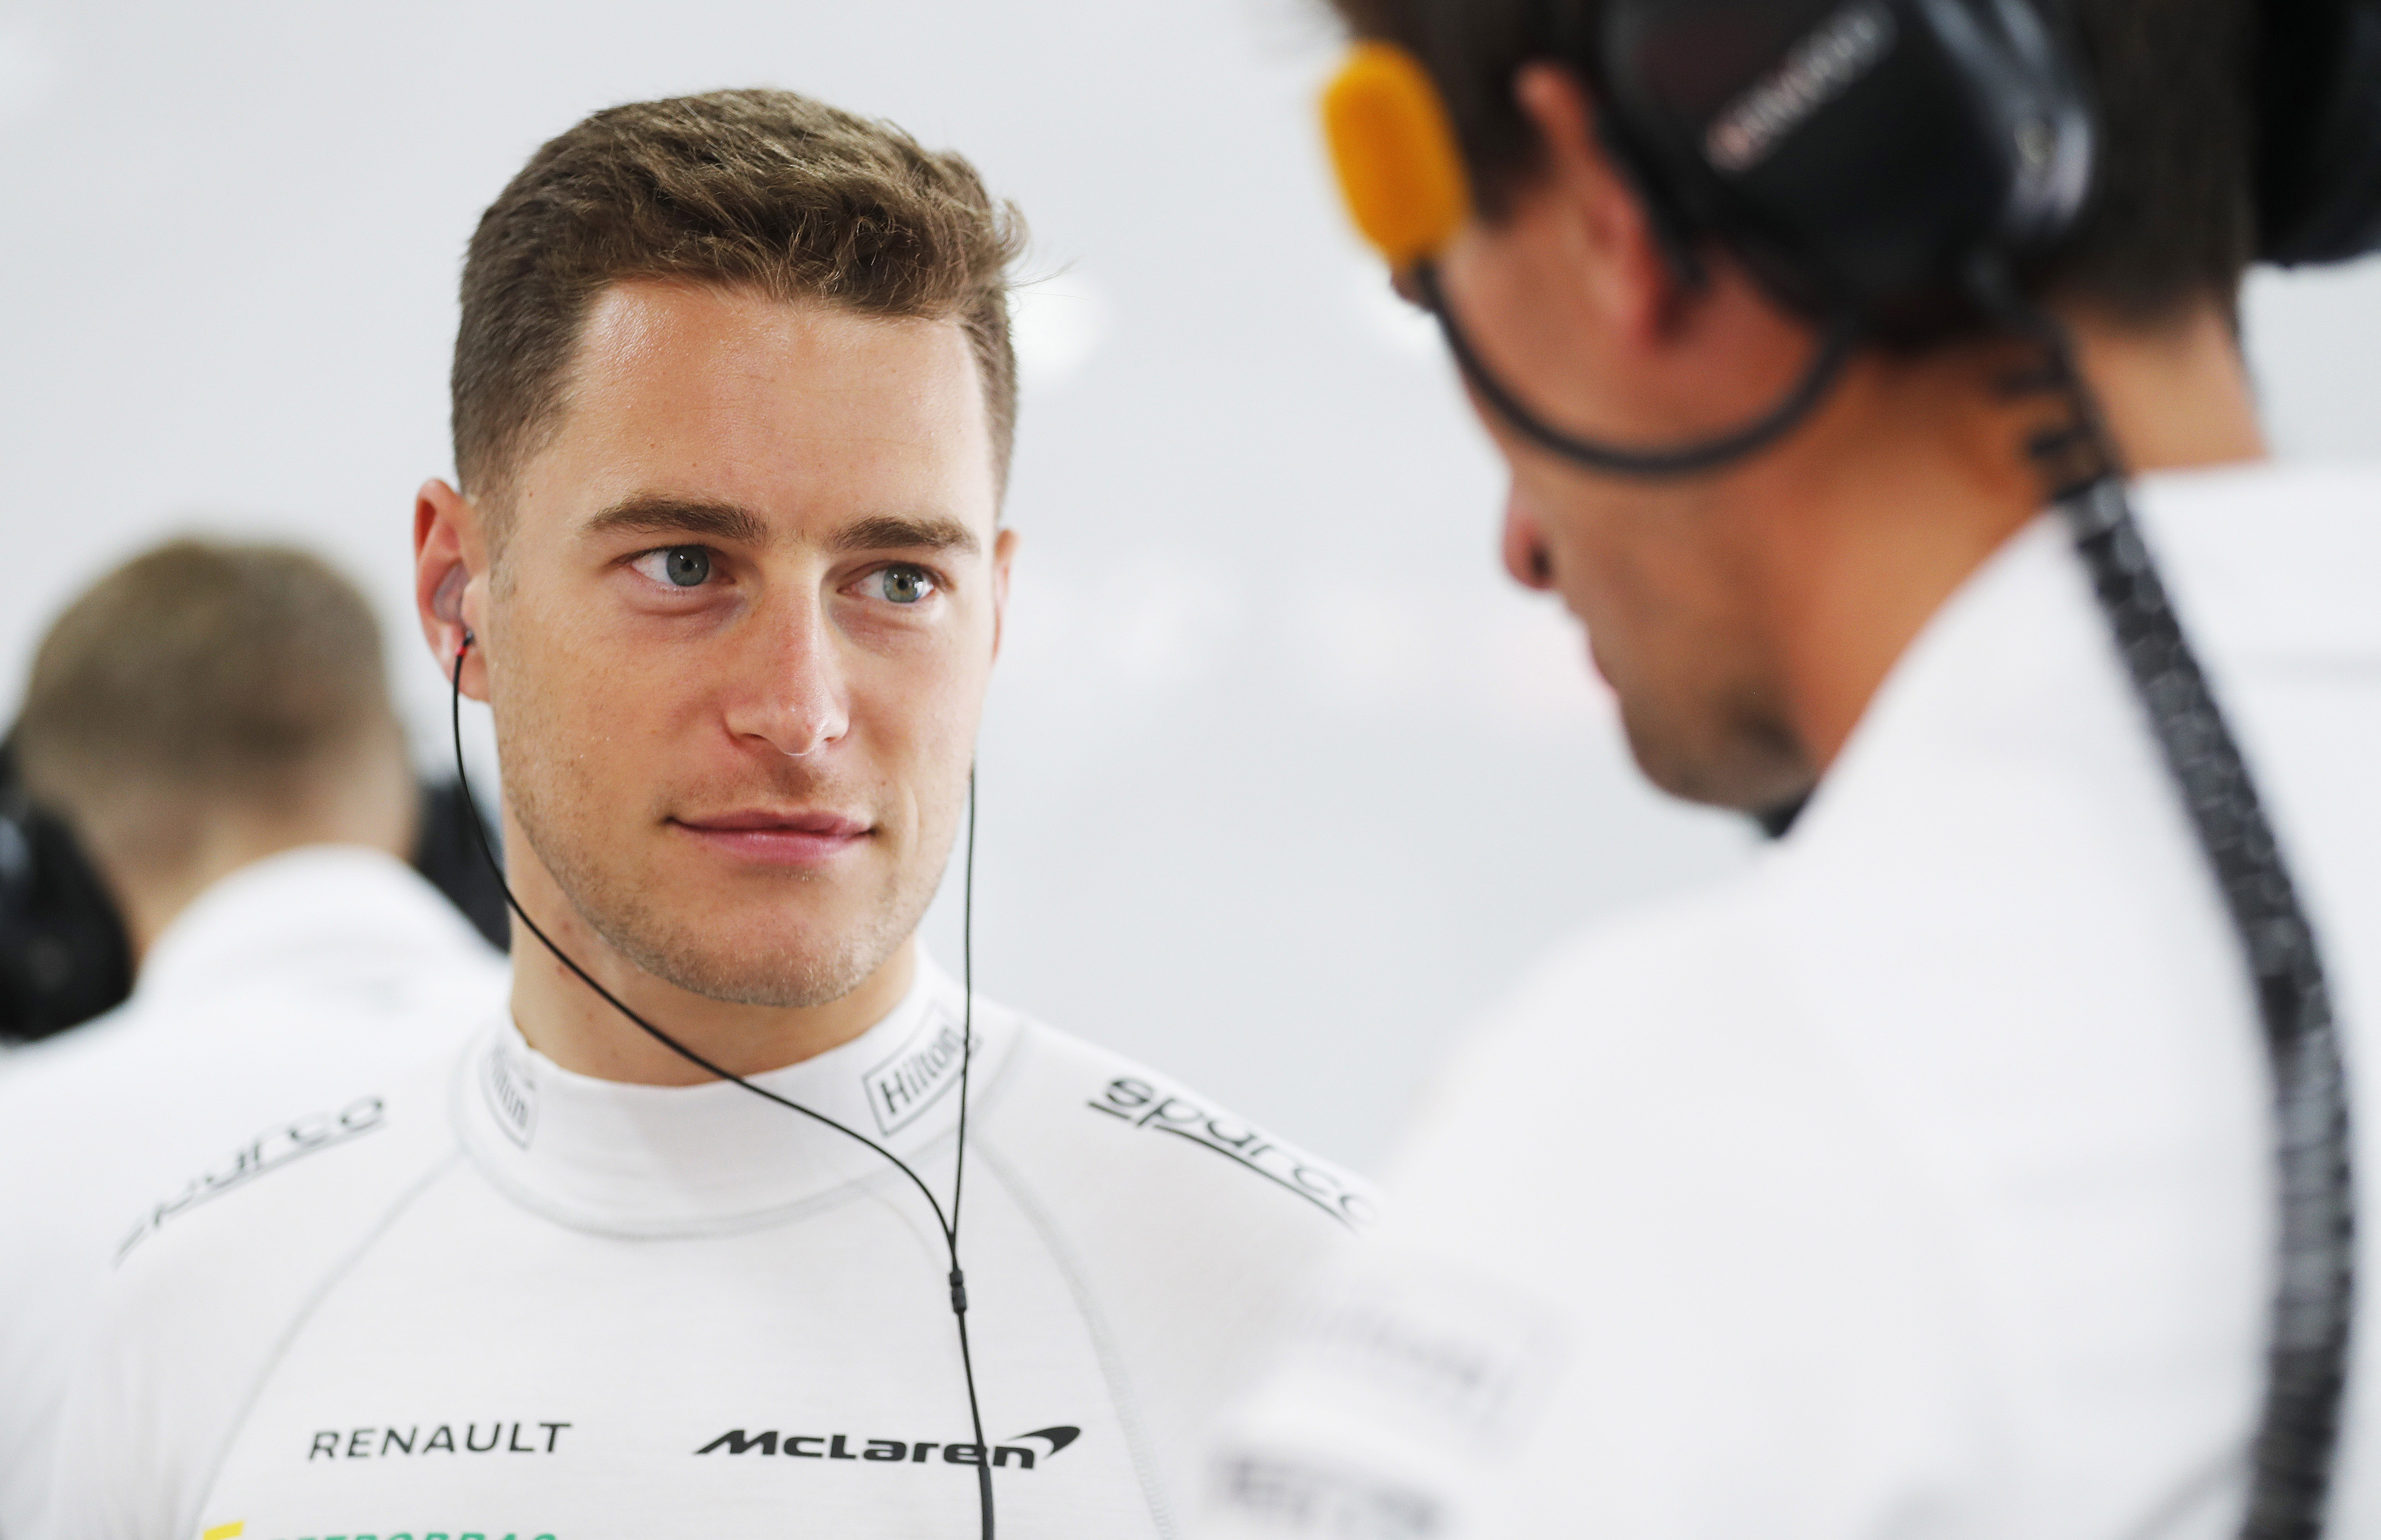 Mclaren preview video 2018 Abu Dhabi GP